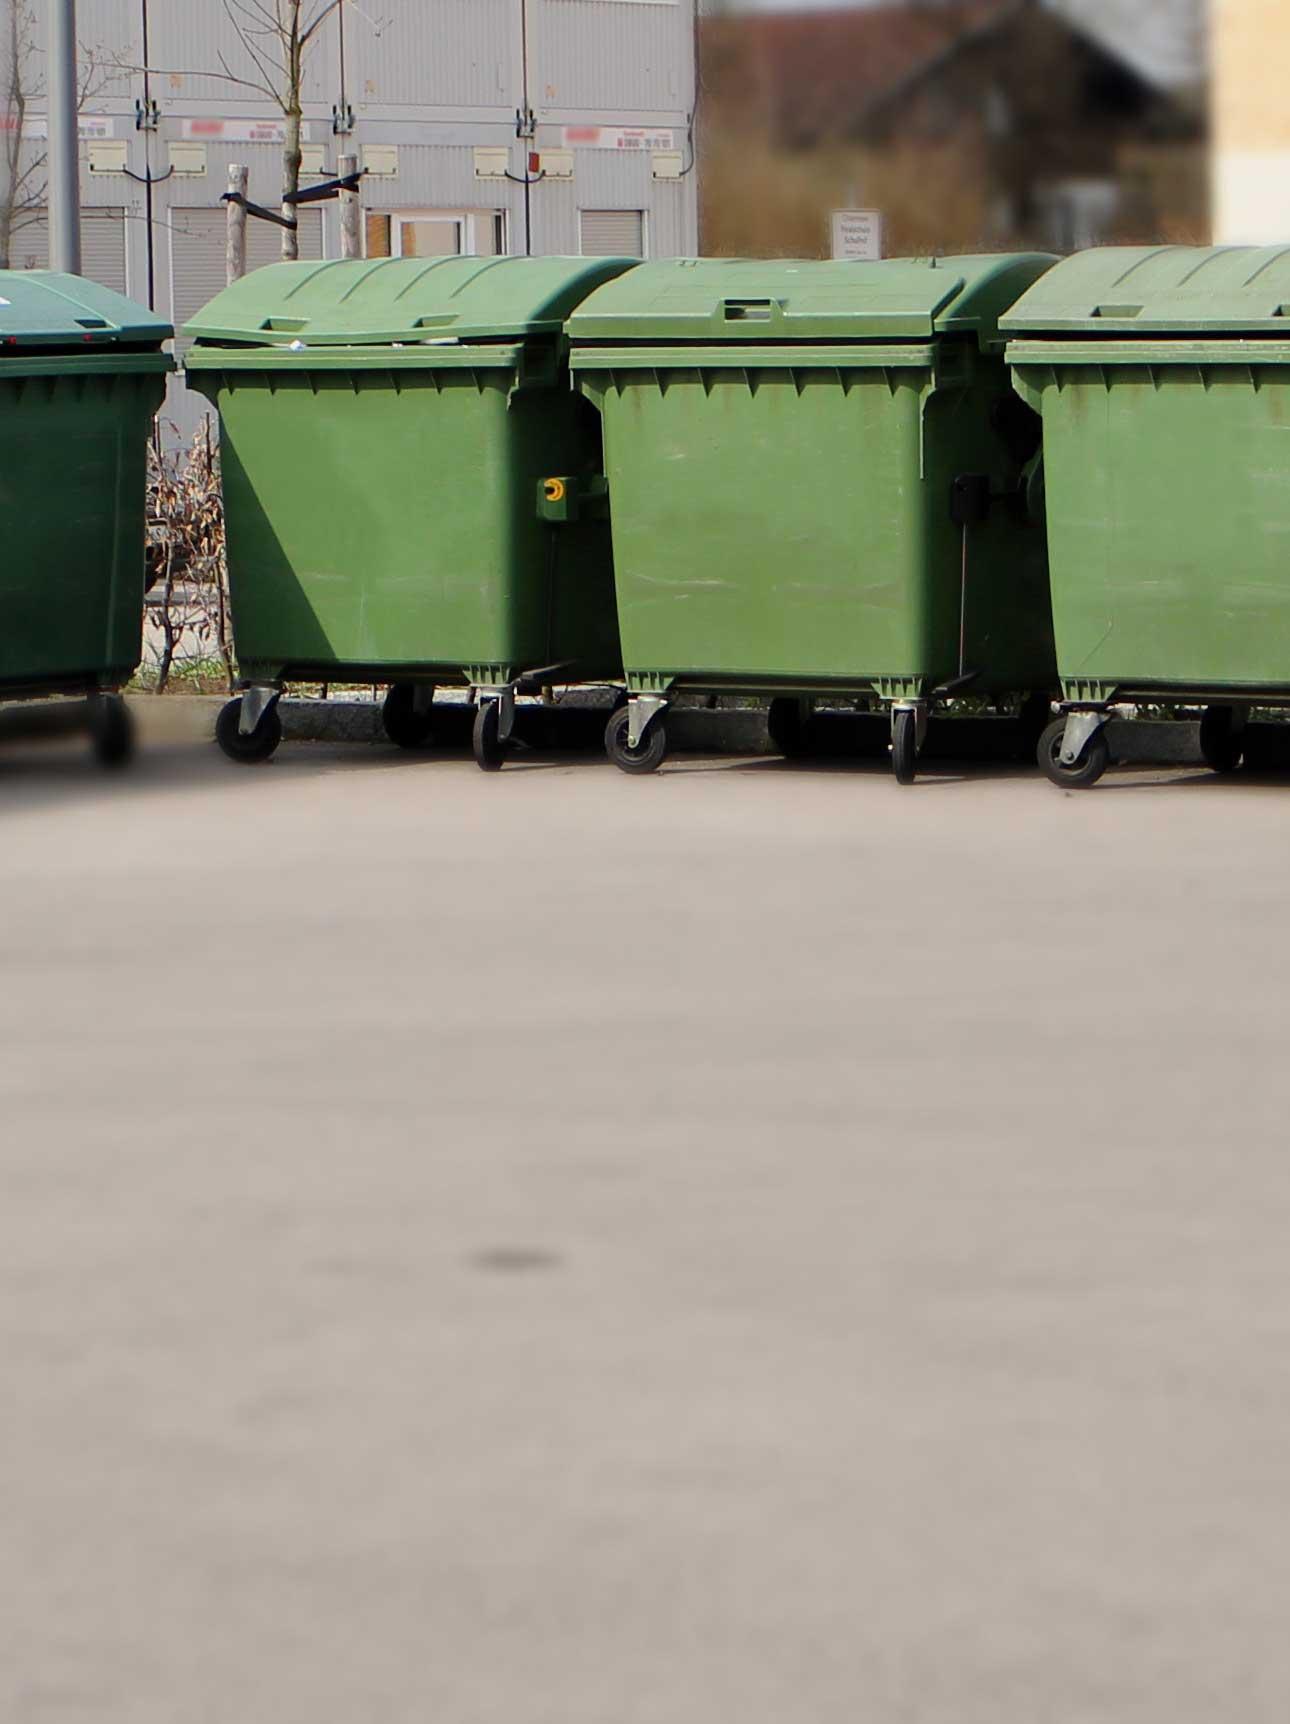 Commercial Wheelie Bin Cleaning, Norwich and Norfolk